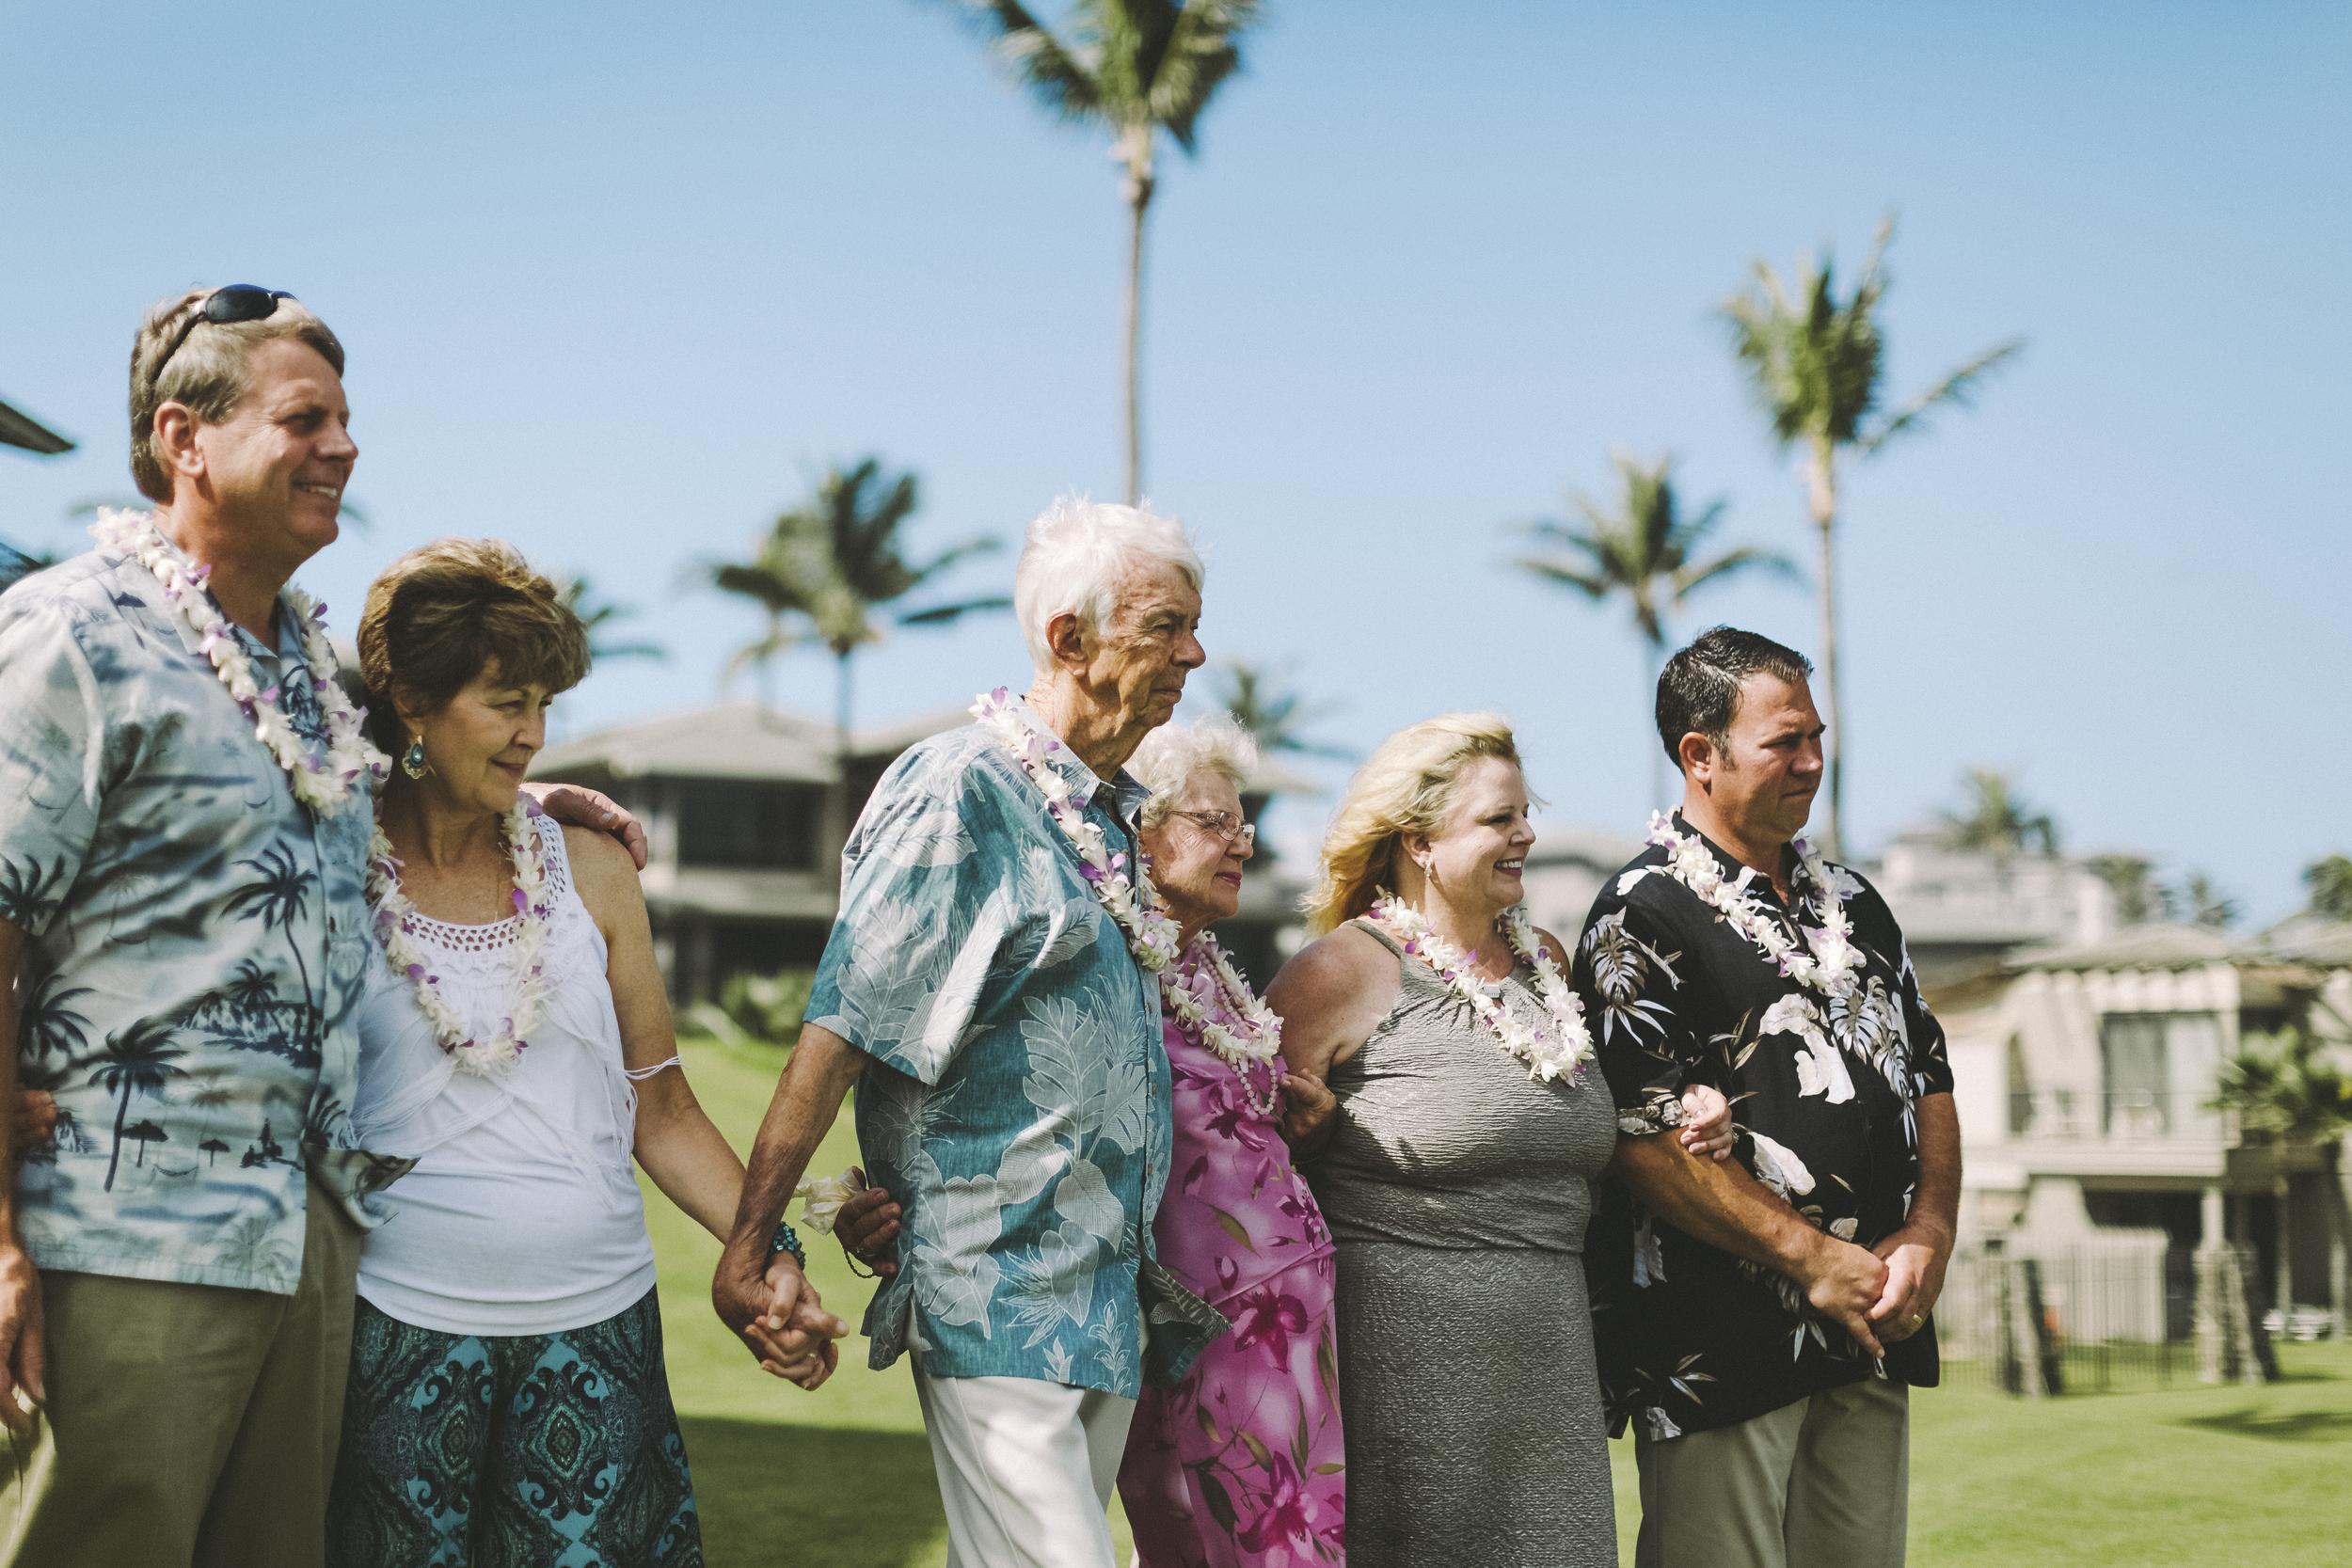 angie-diaz-photography-hawaii-wedding-14.jpg